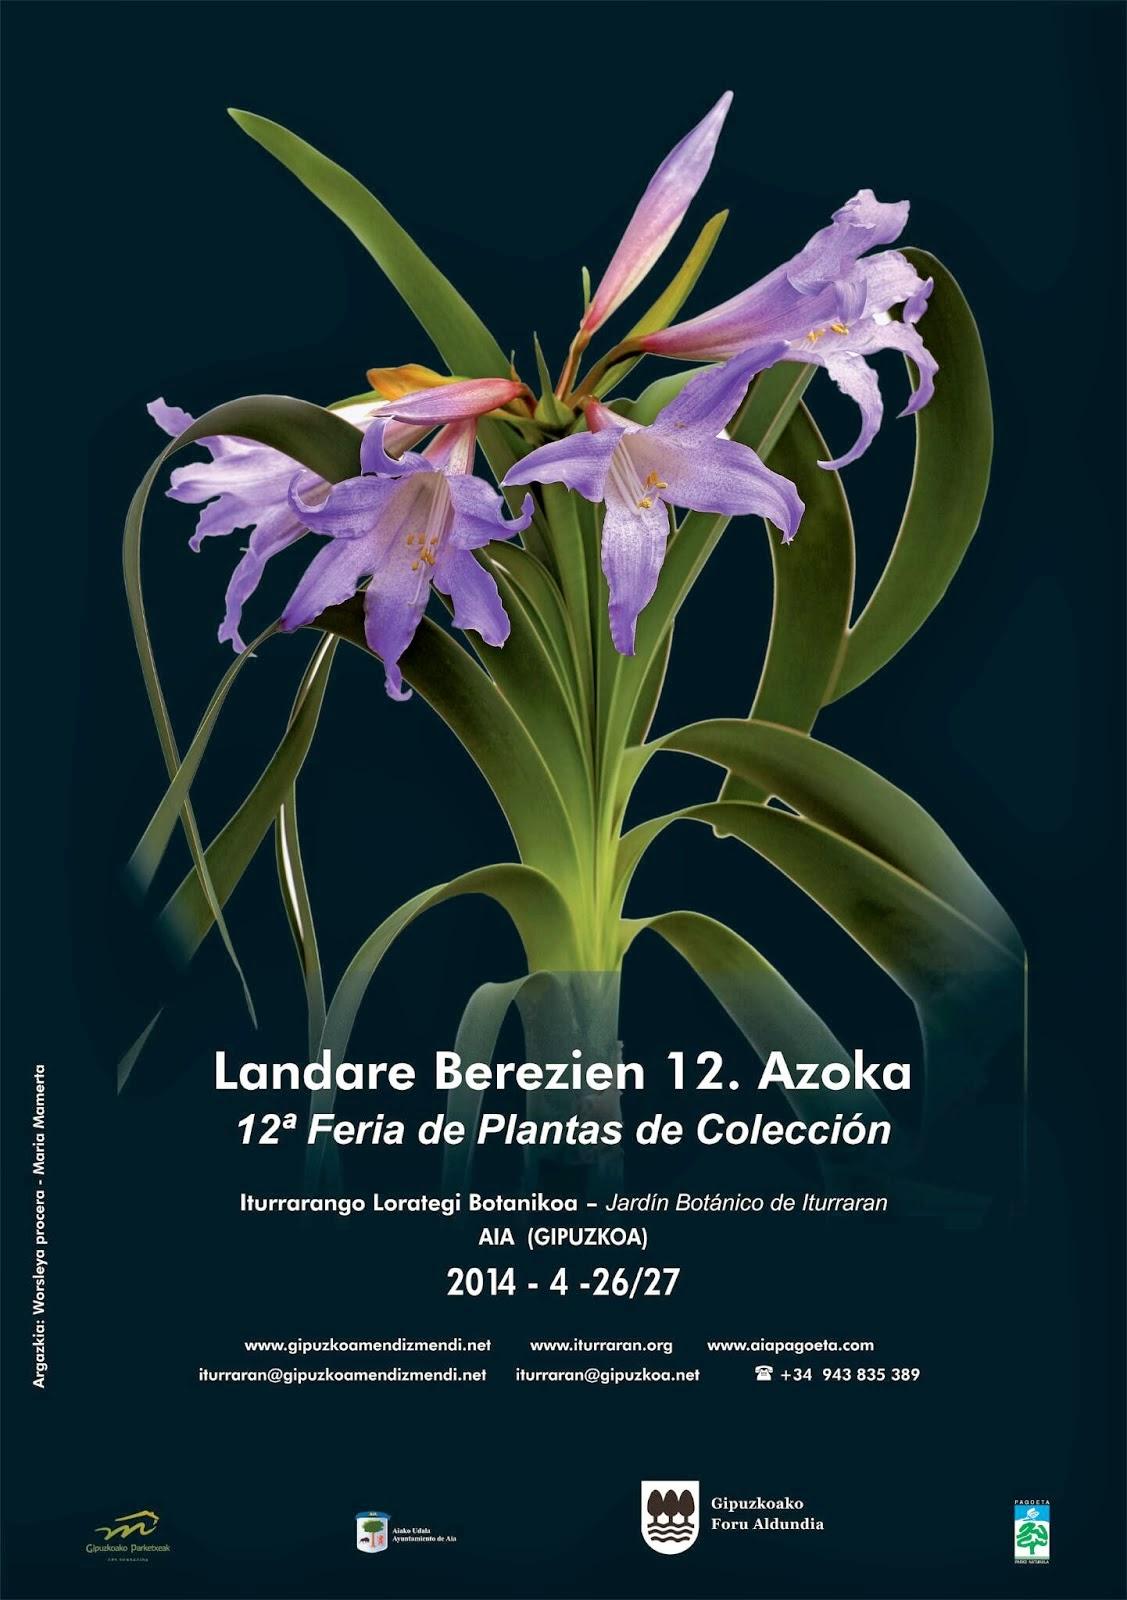 XII Feria de Plantas de Colección, Jardín Botánico Iturraran, 2014